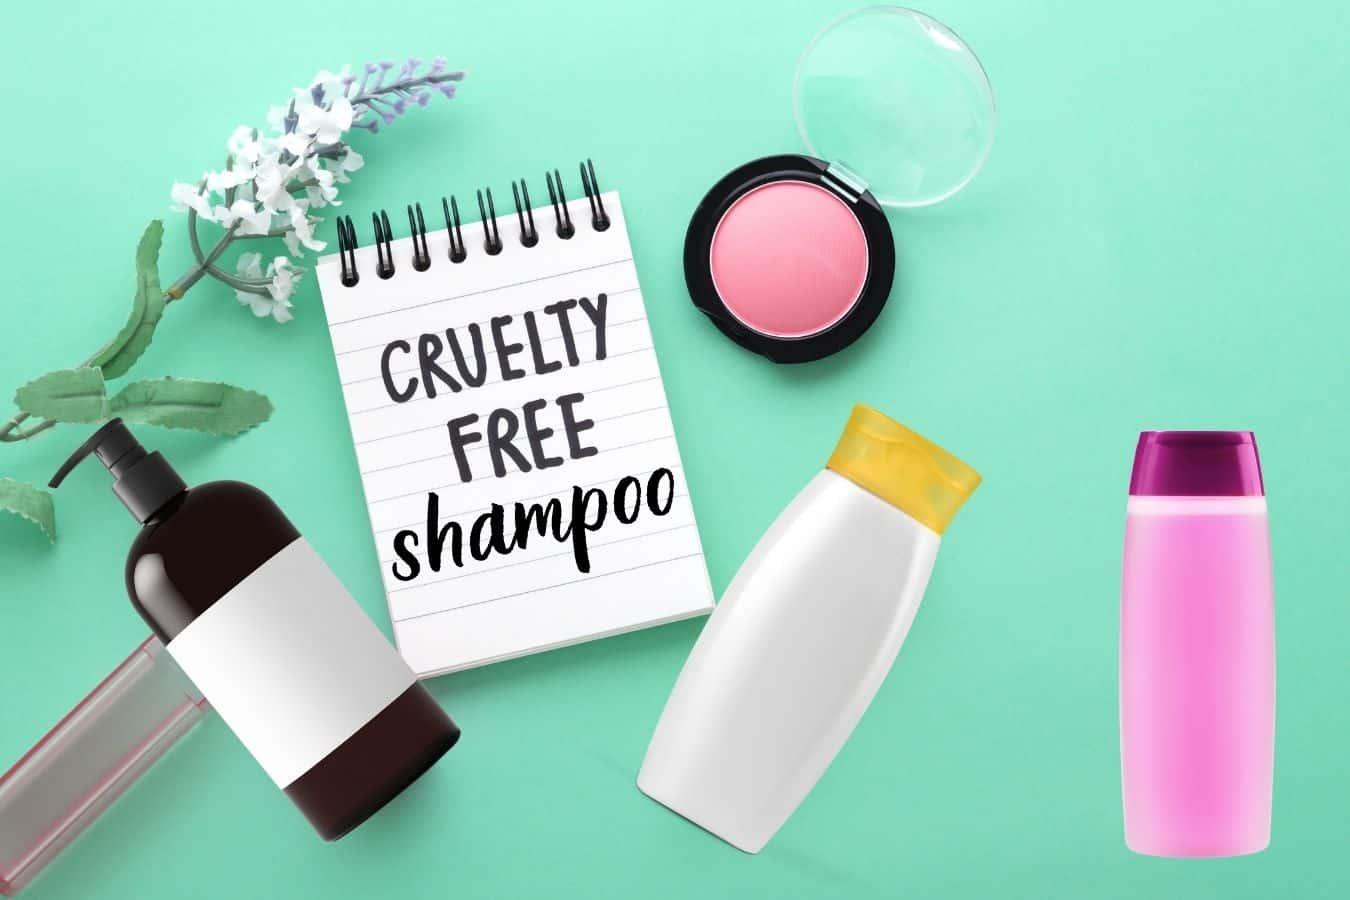 cruelty-free shampoo